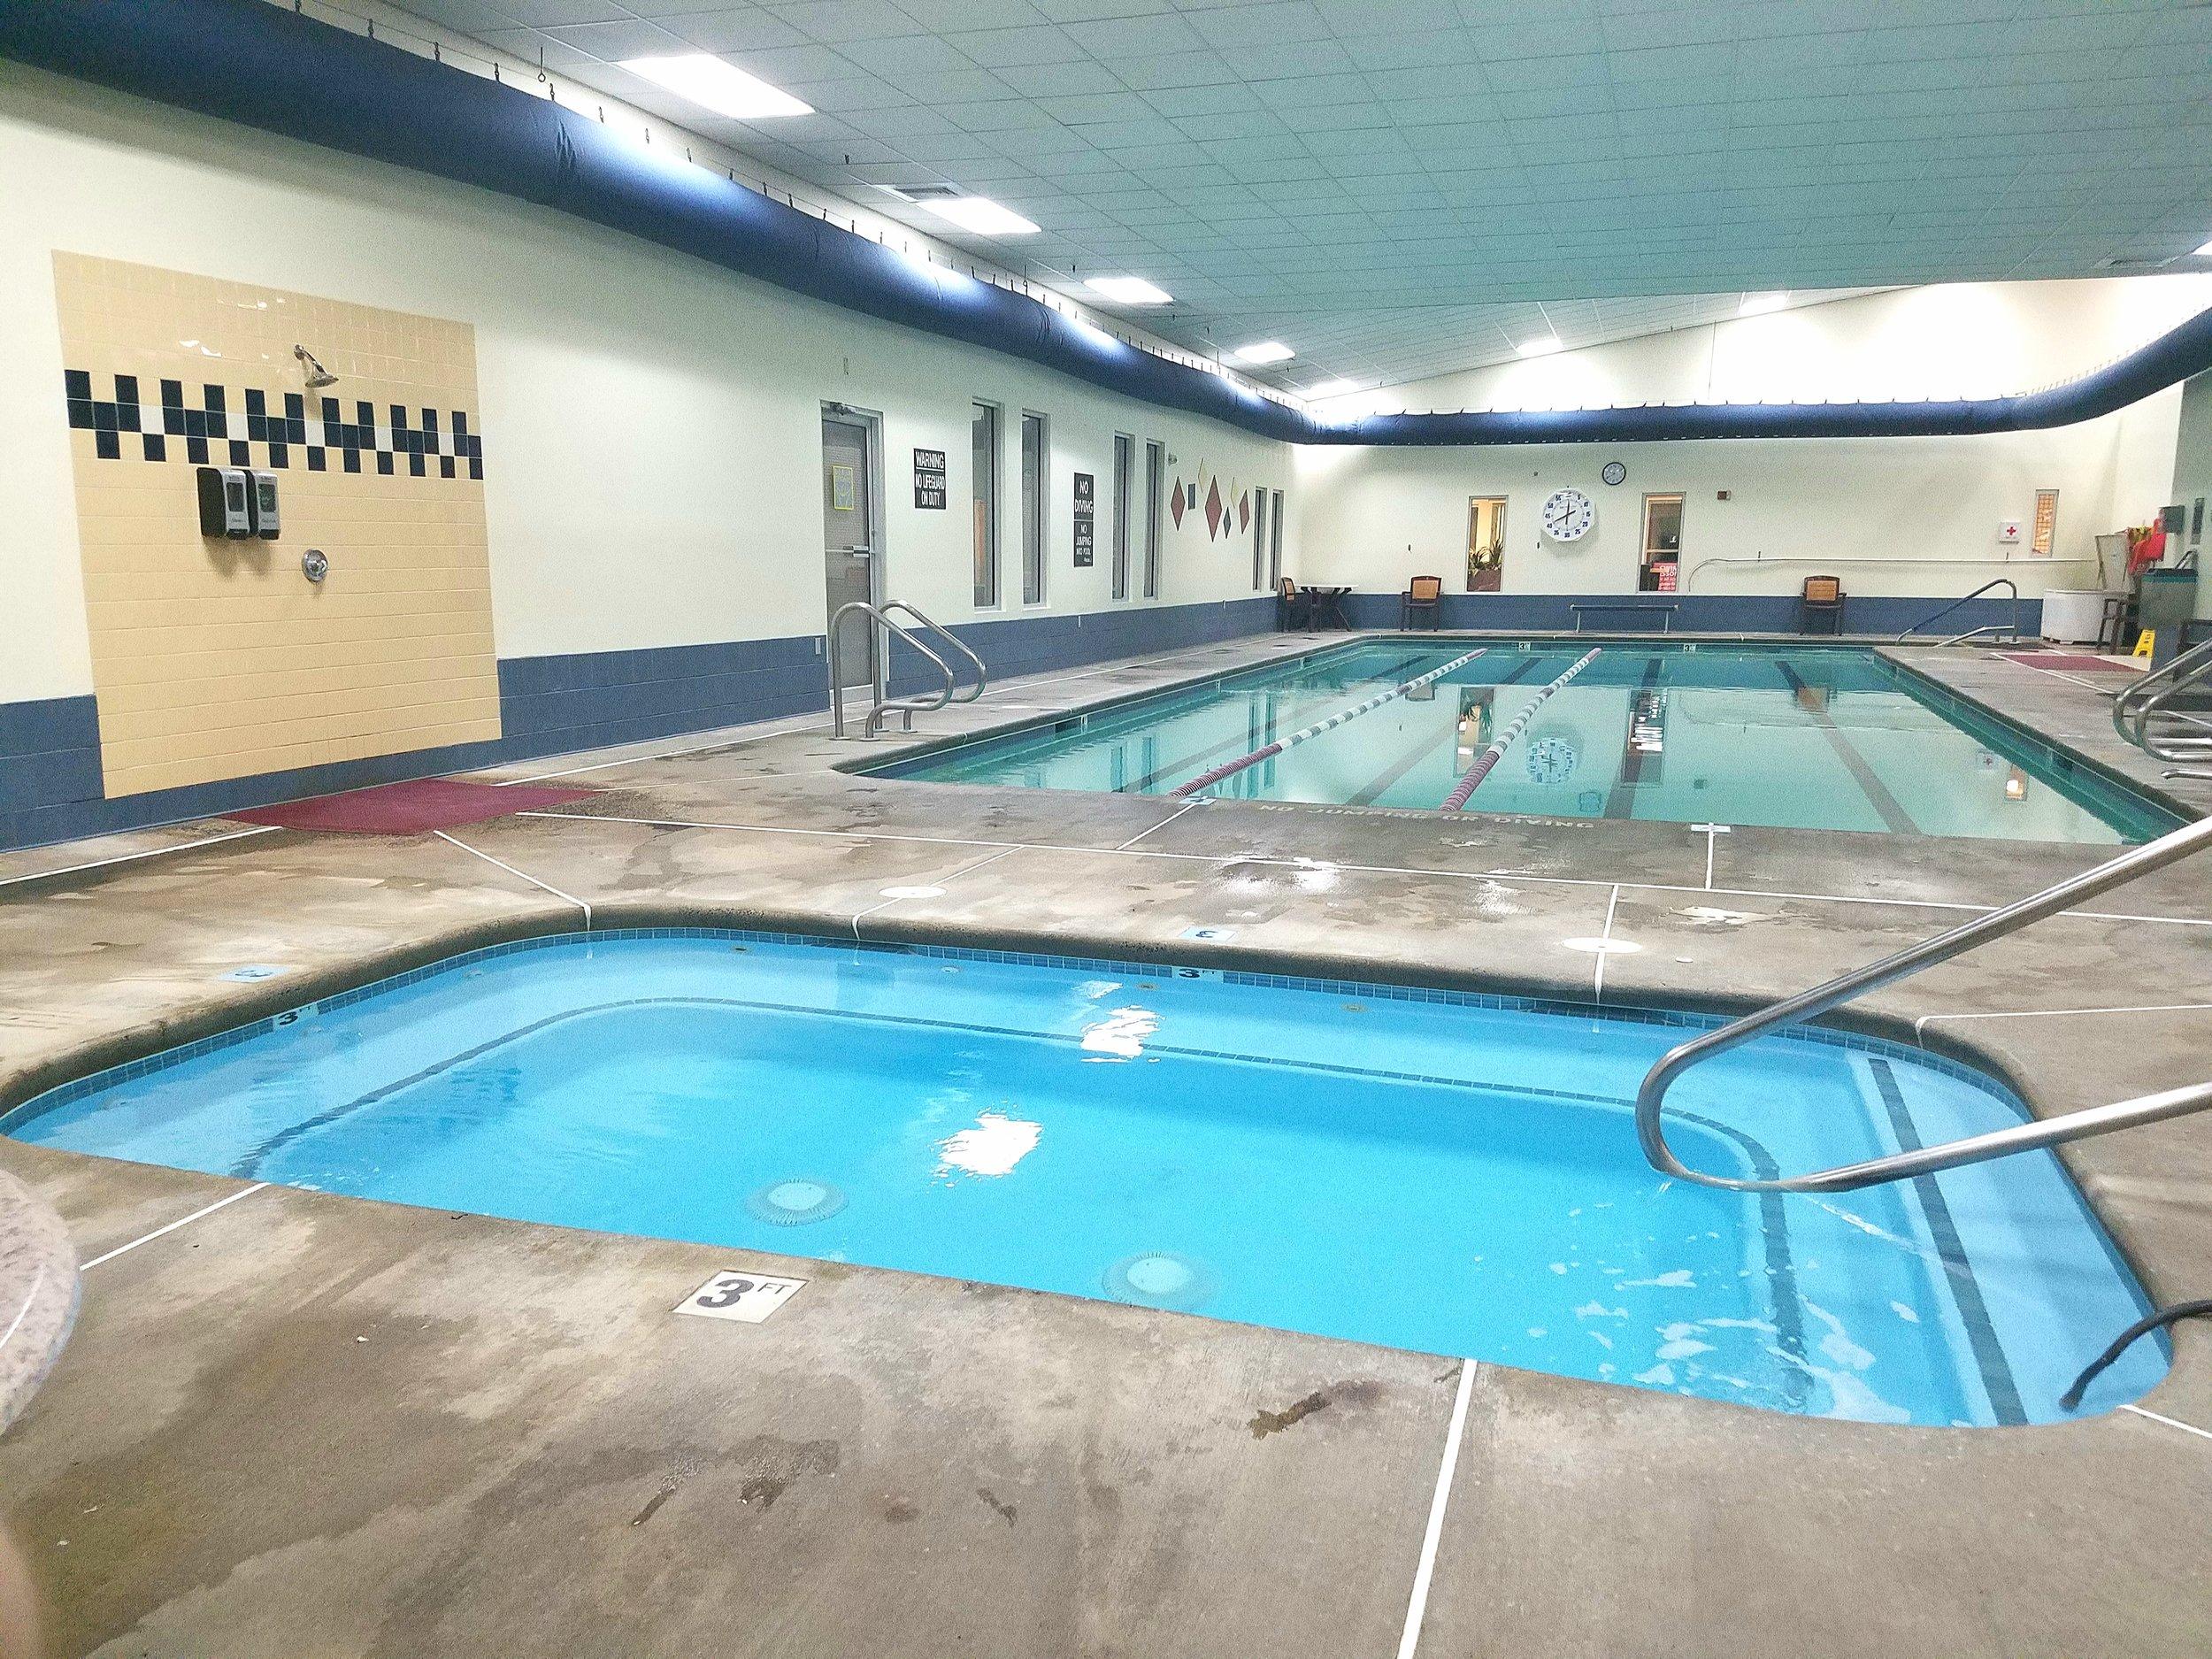 BR Pool and Whirlpool.jpg